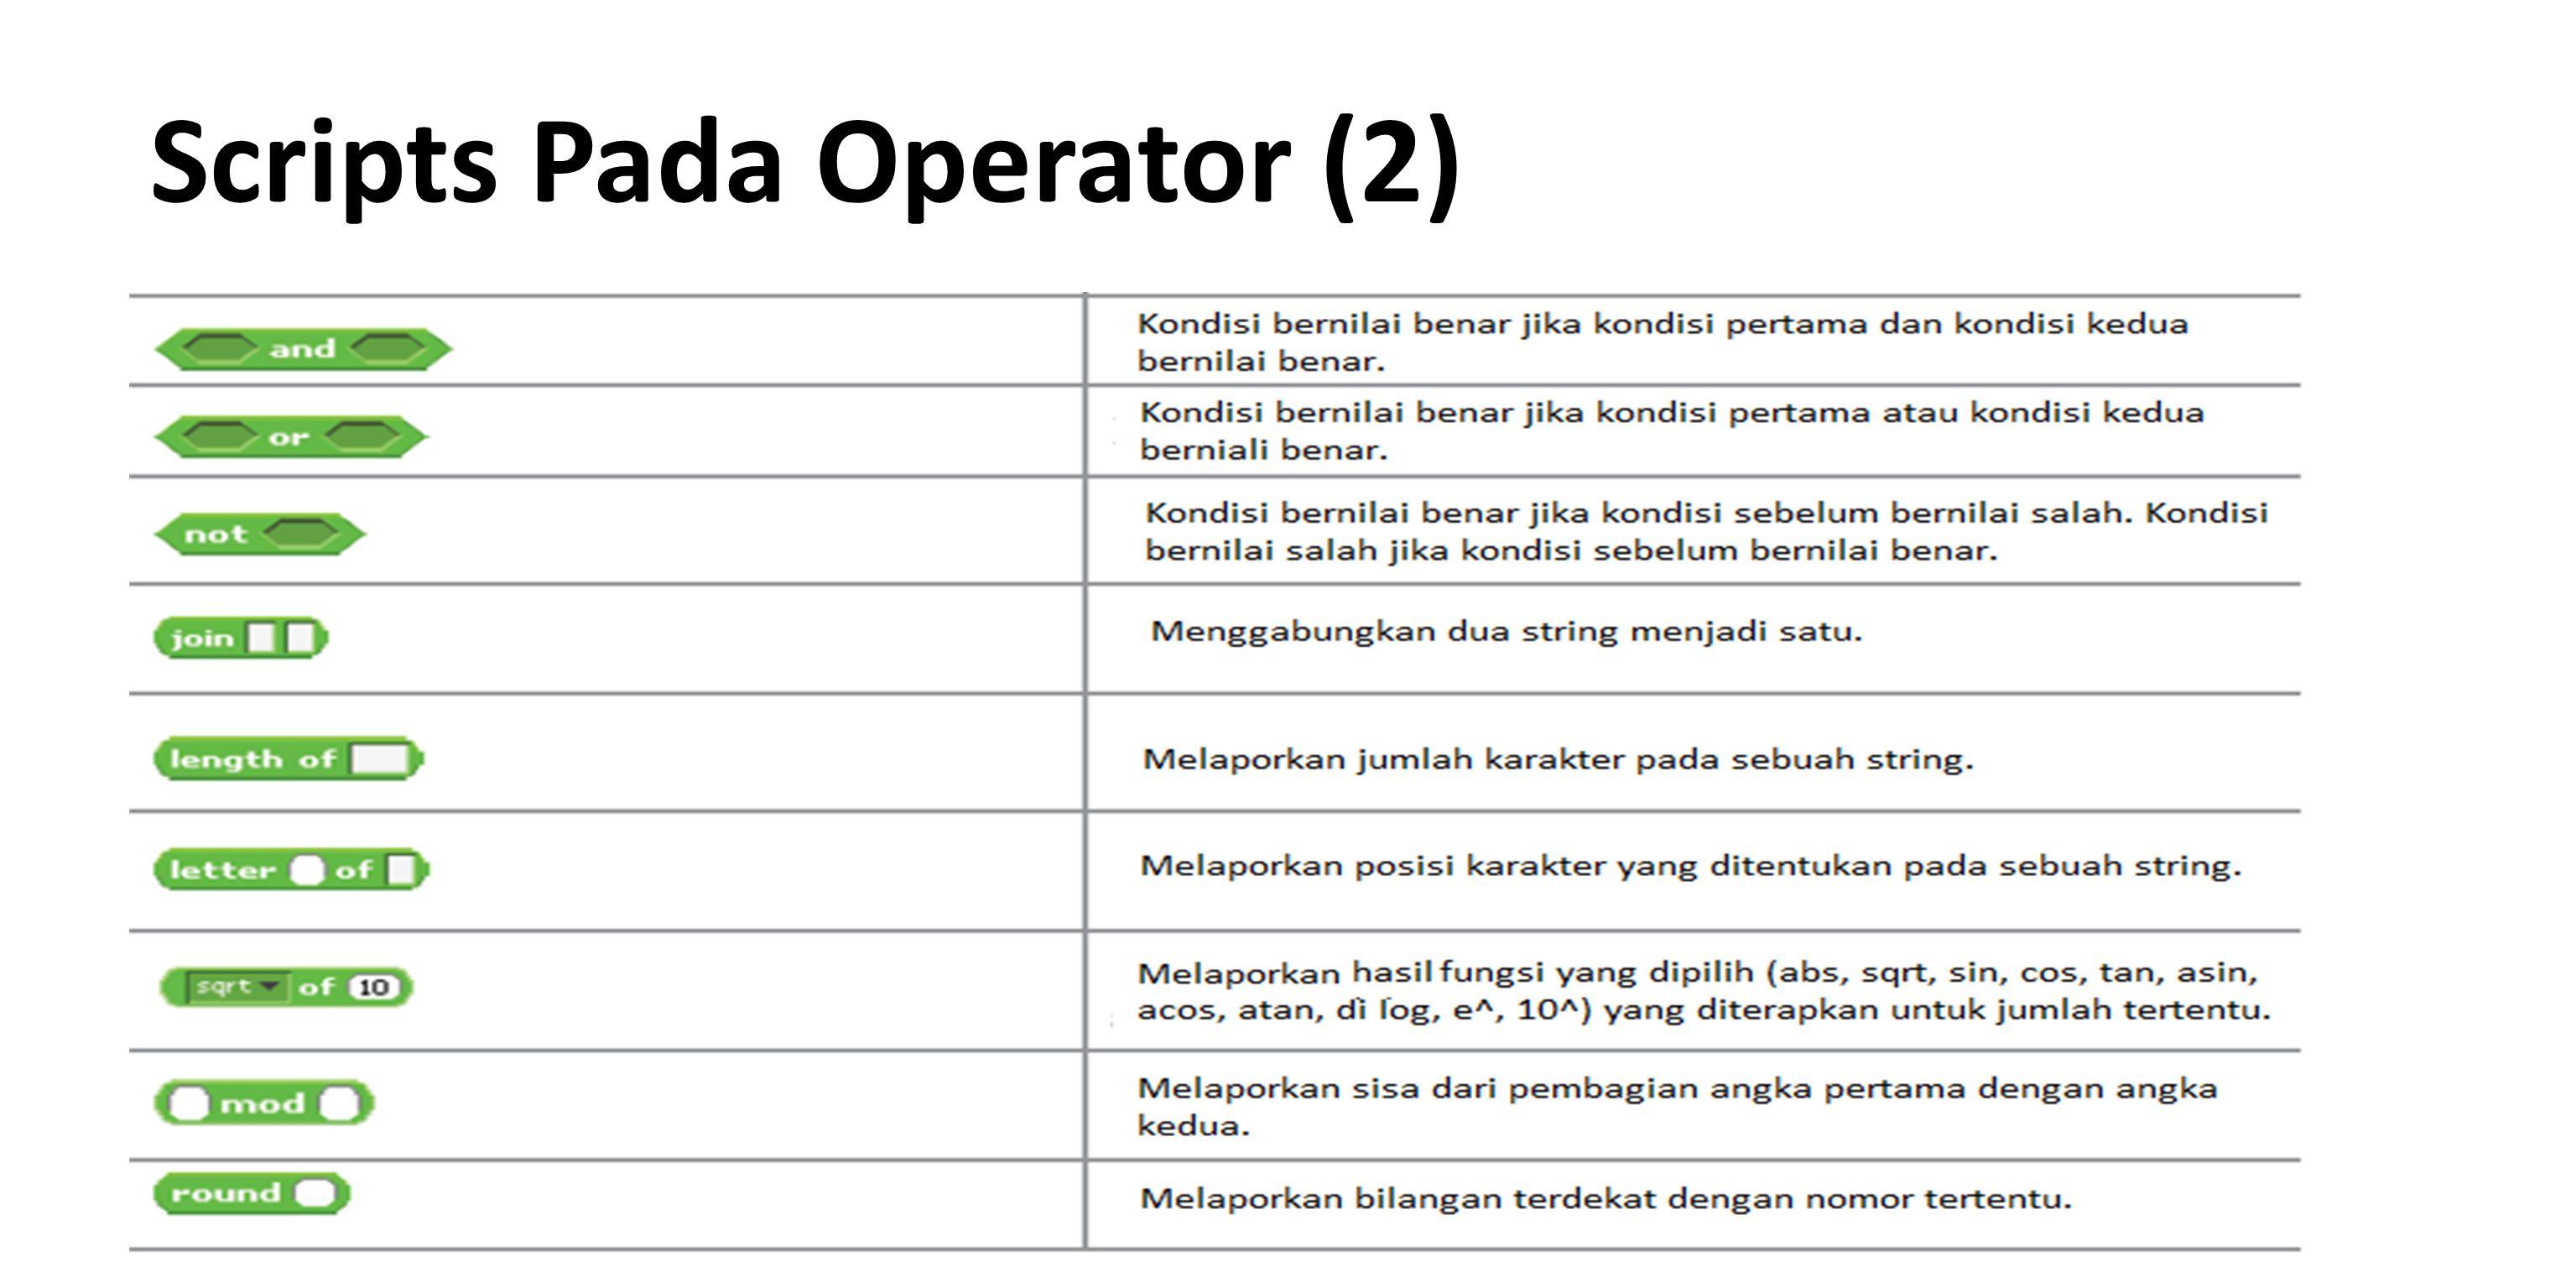 Scripts Pada Operator (2)